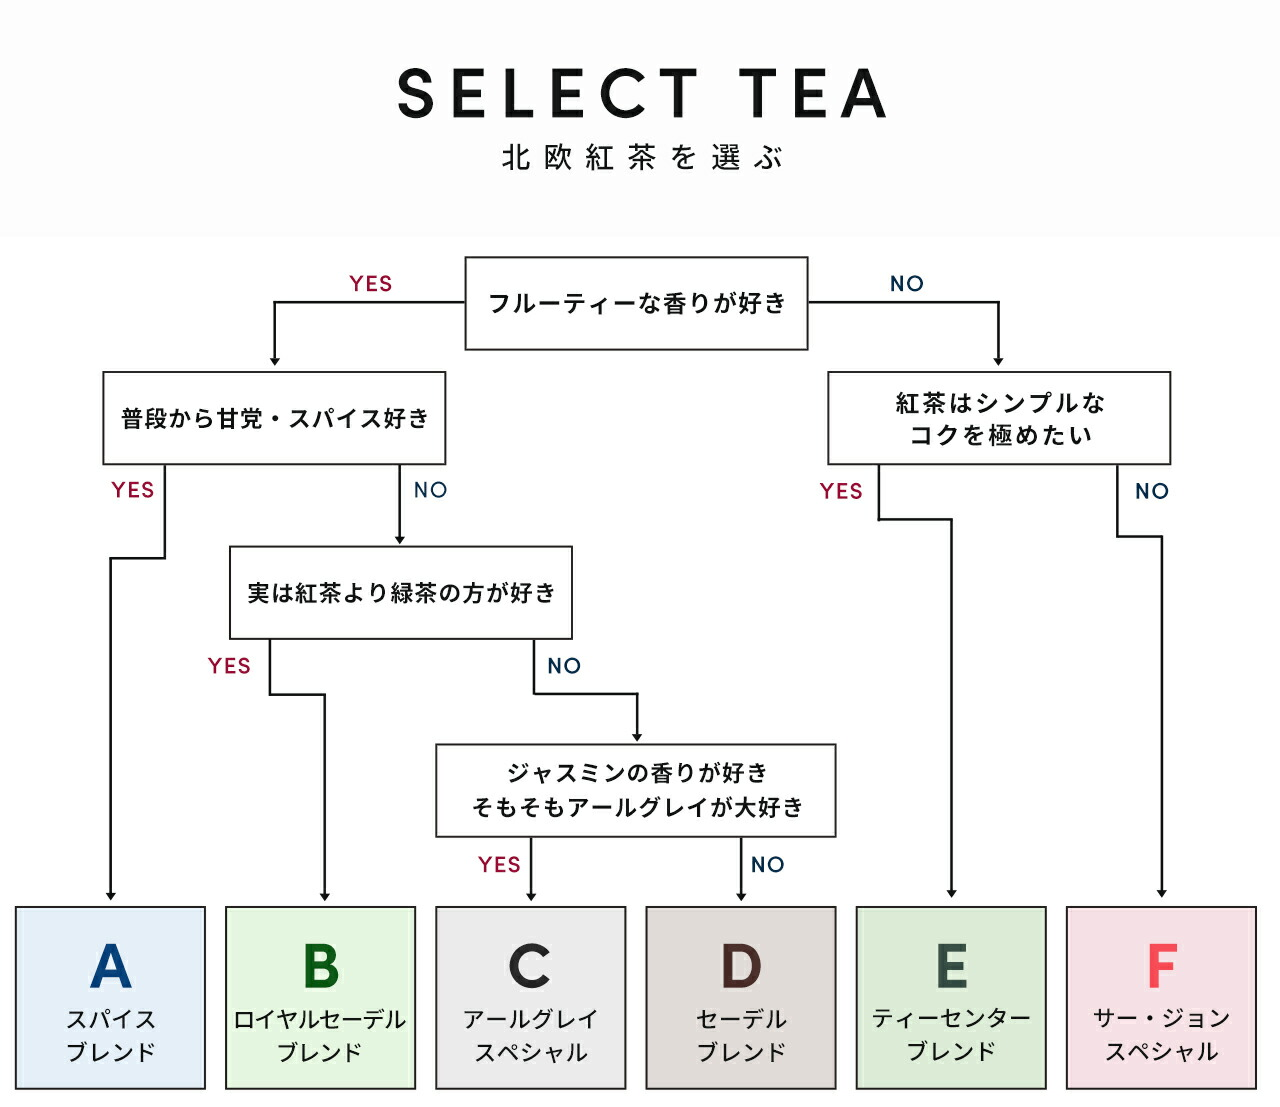 SELECTTEA/北欧紅茶を選ぶ